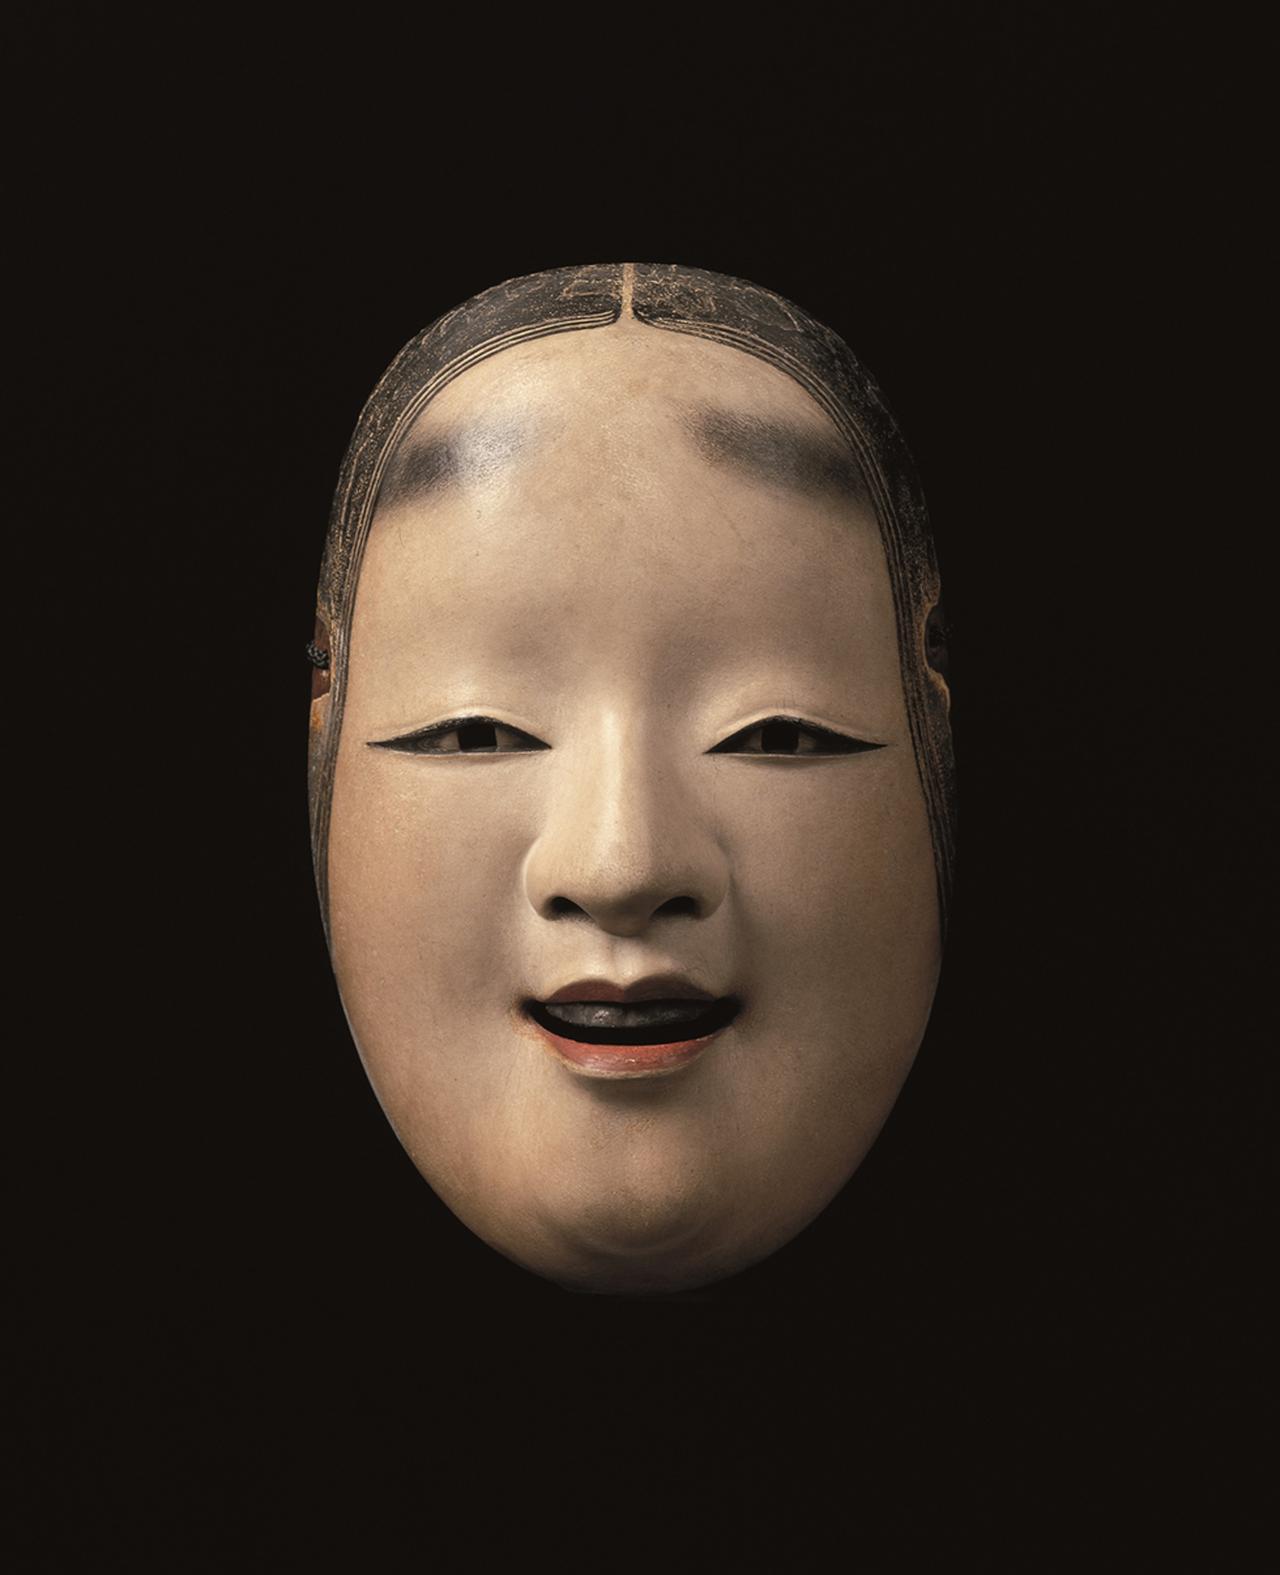 Images : 1番目の画像 - 「能面に誘われてーー。 能楽師がキュレーションする 幽玄なる能の装飾品」のアルバム - T JAPAN:The New York Times Style Magazine 公式サイト